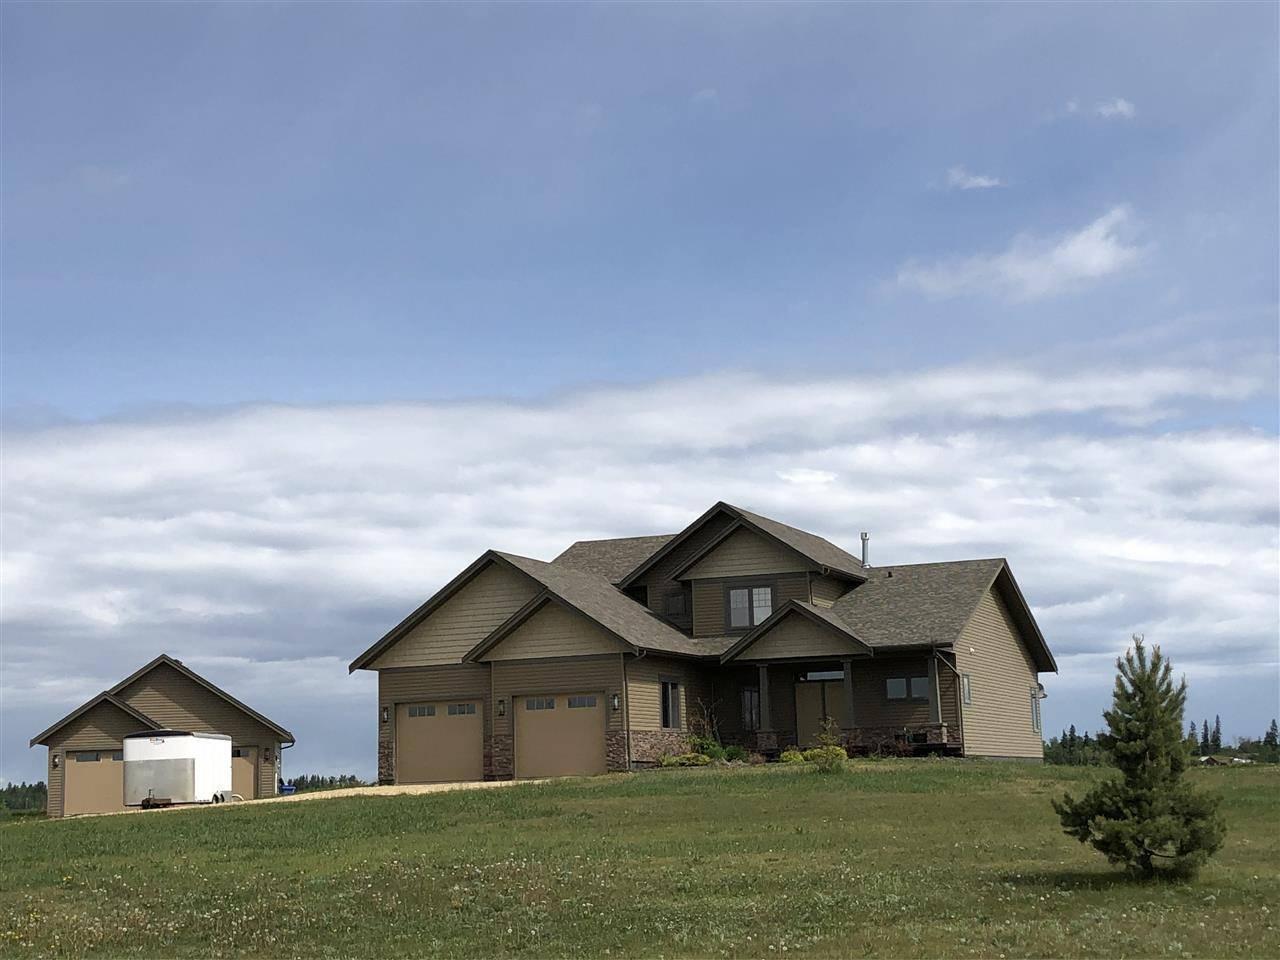 33 - 243050 Twp Road, Rural Wetaskiwin County | Image 2